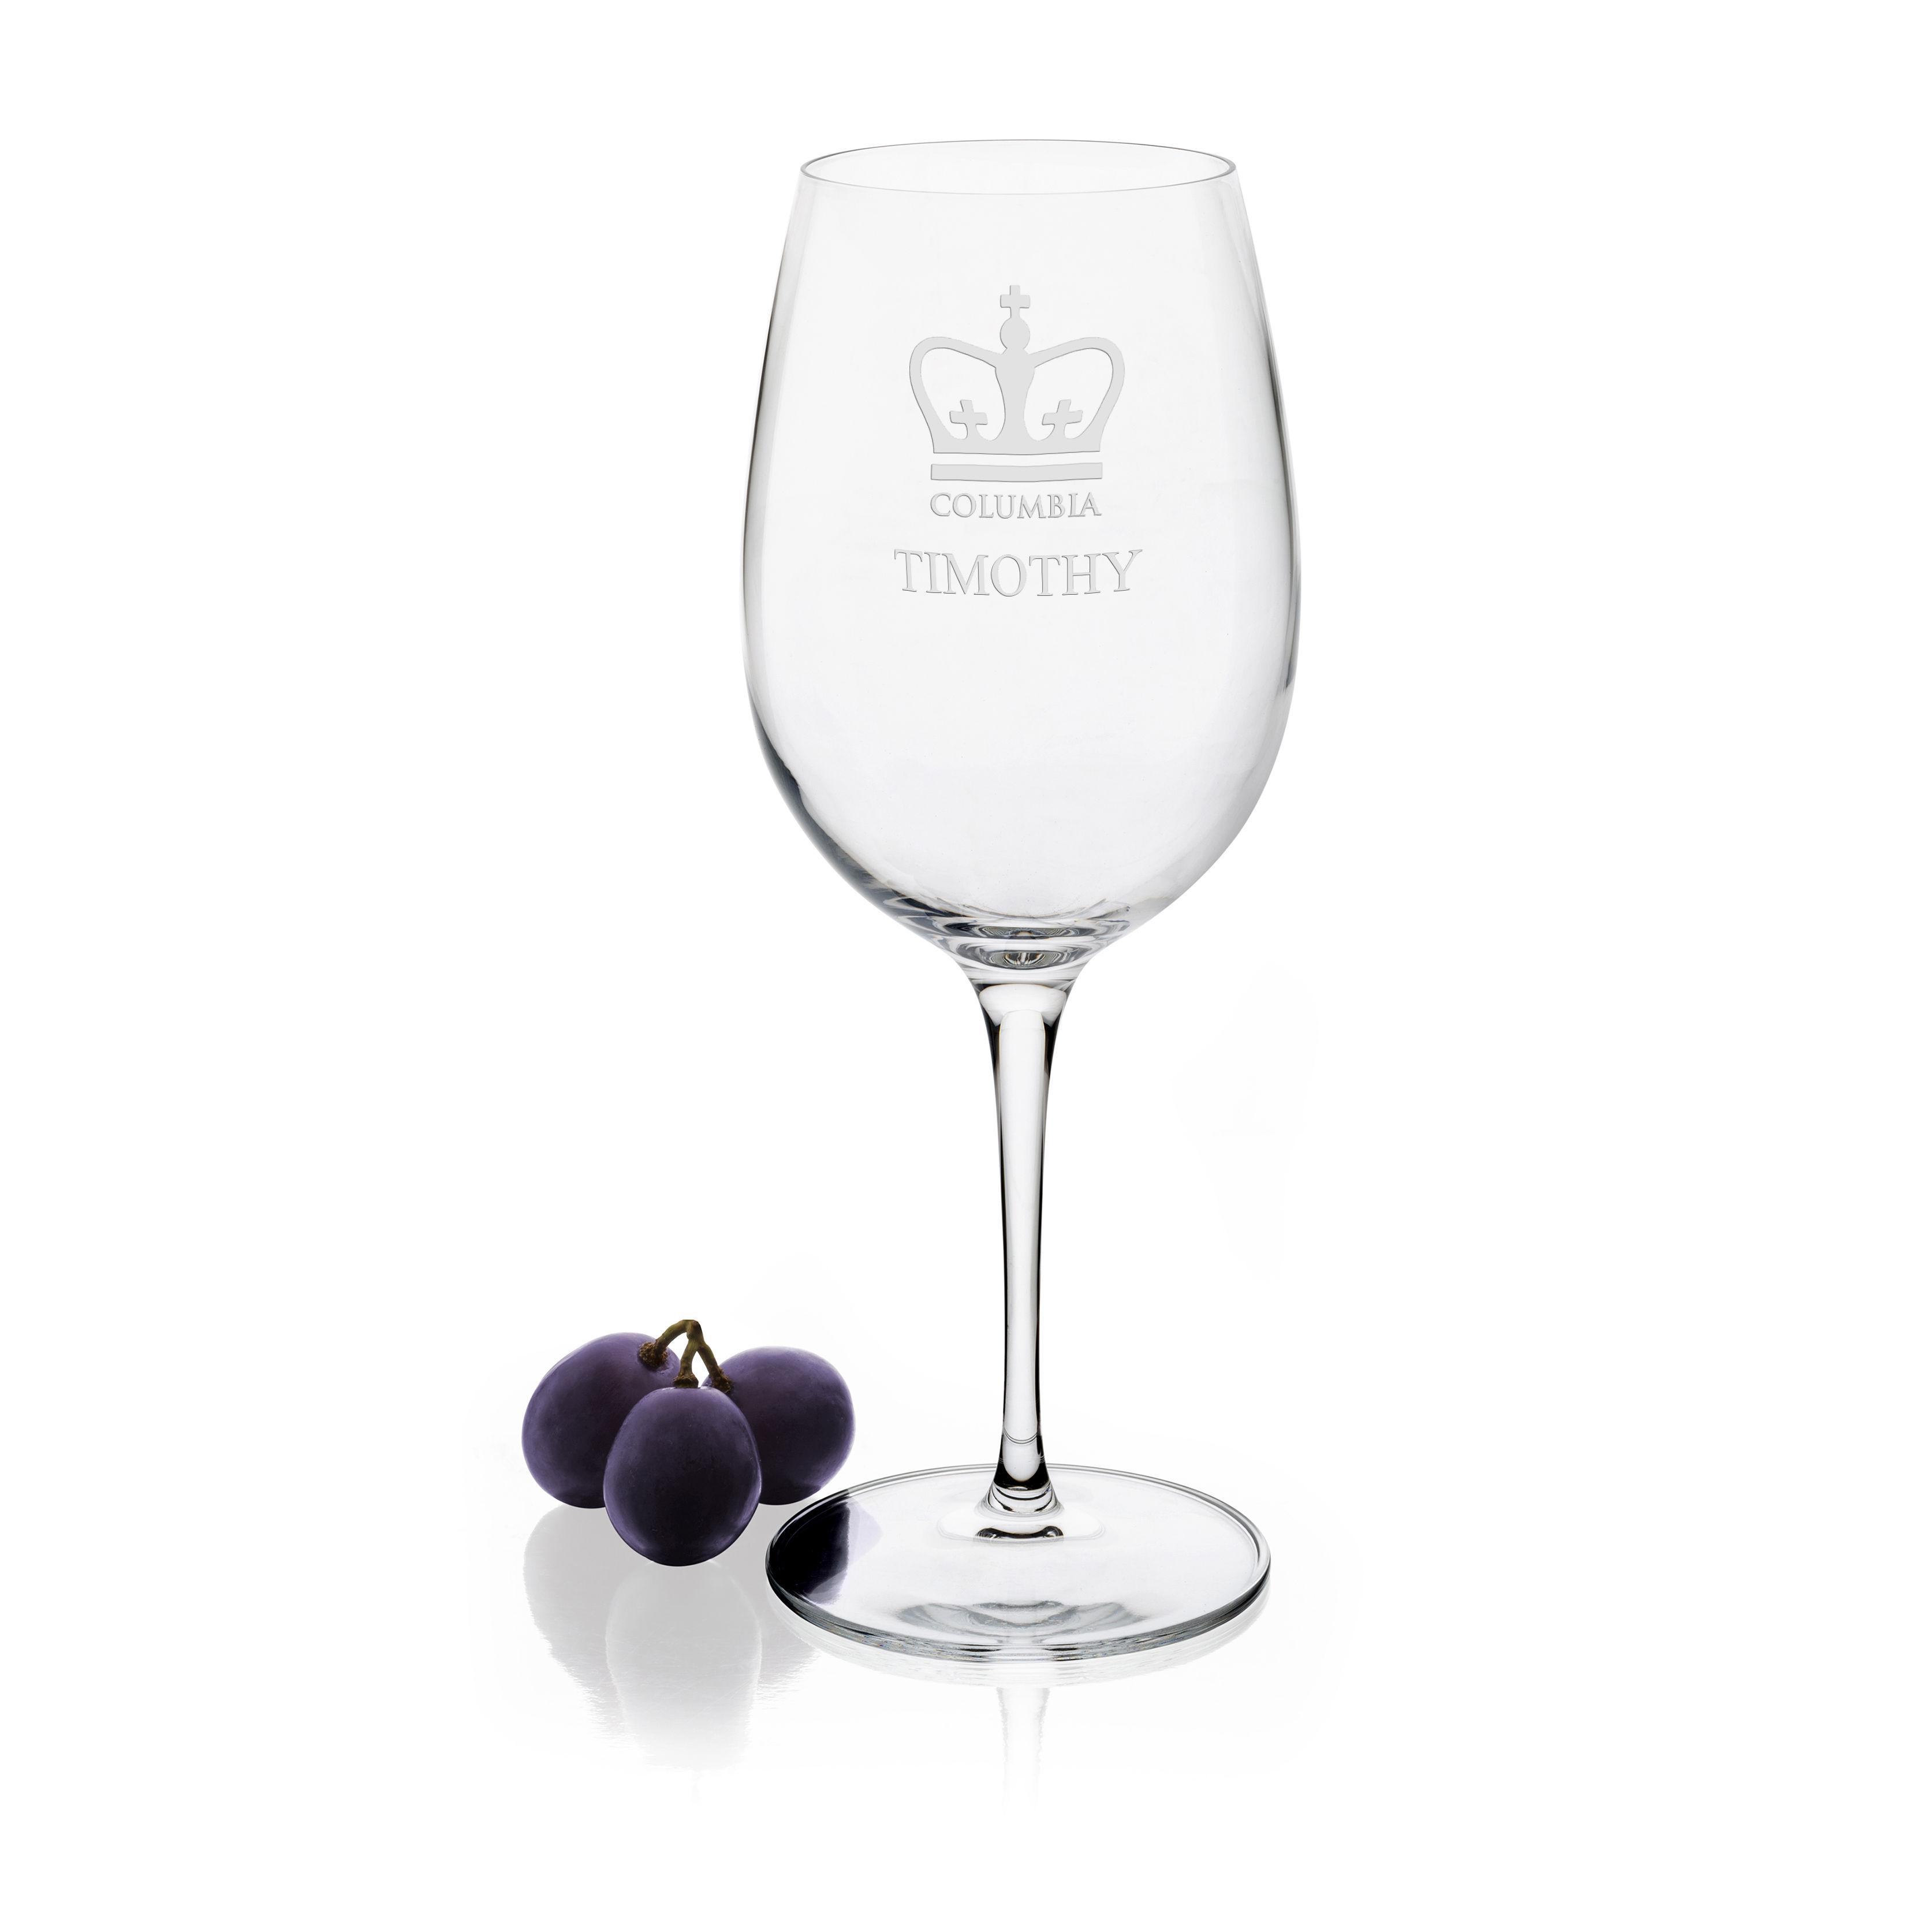 Columbia University Red Wine Glasses - Set of 2